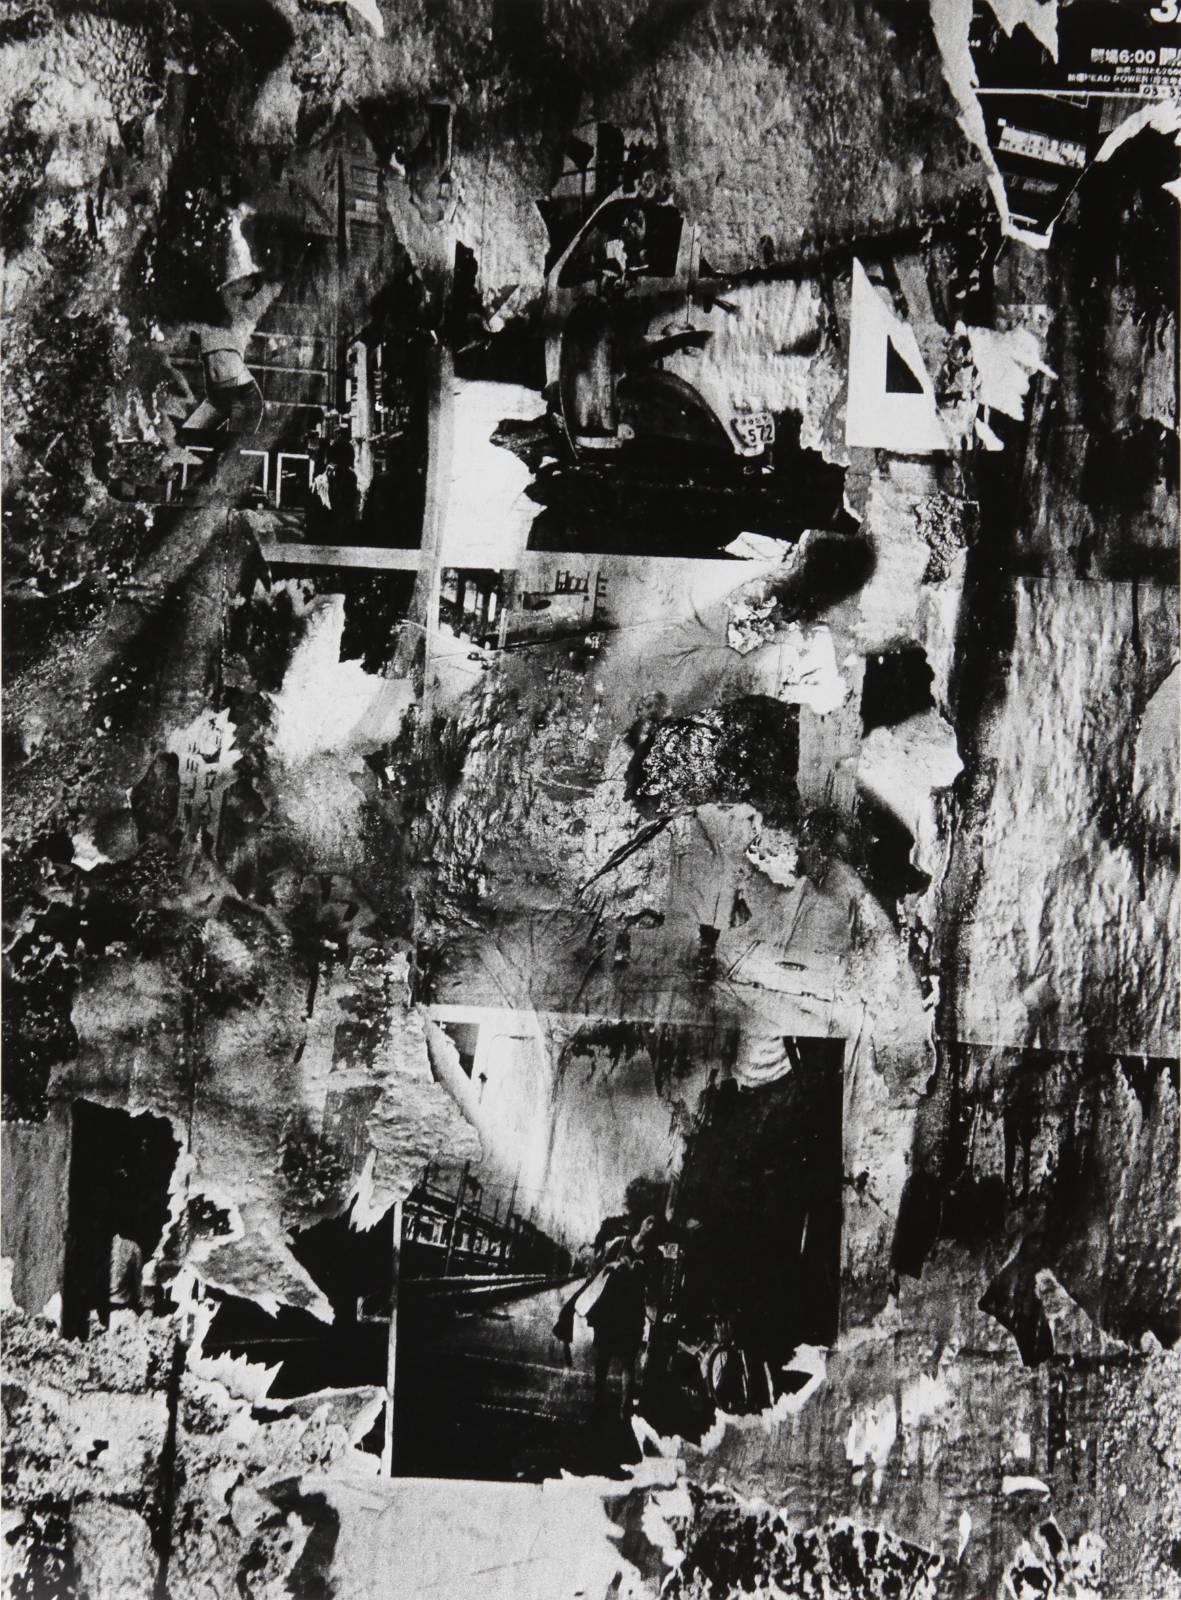 Kyoku/Erotica, 2007/2010, silver-gelatin print, 40,7 x 30 cm